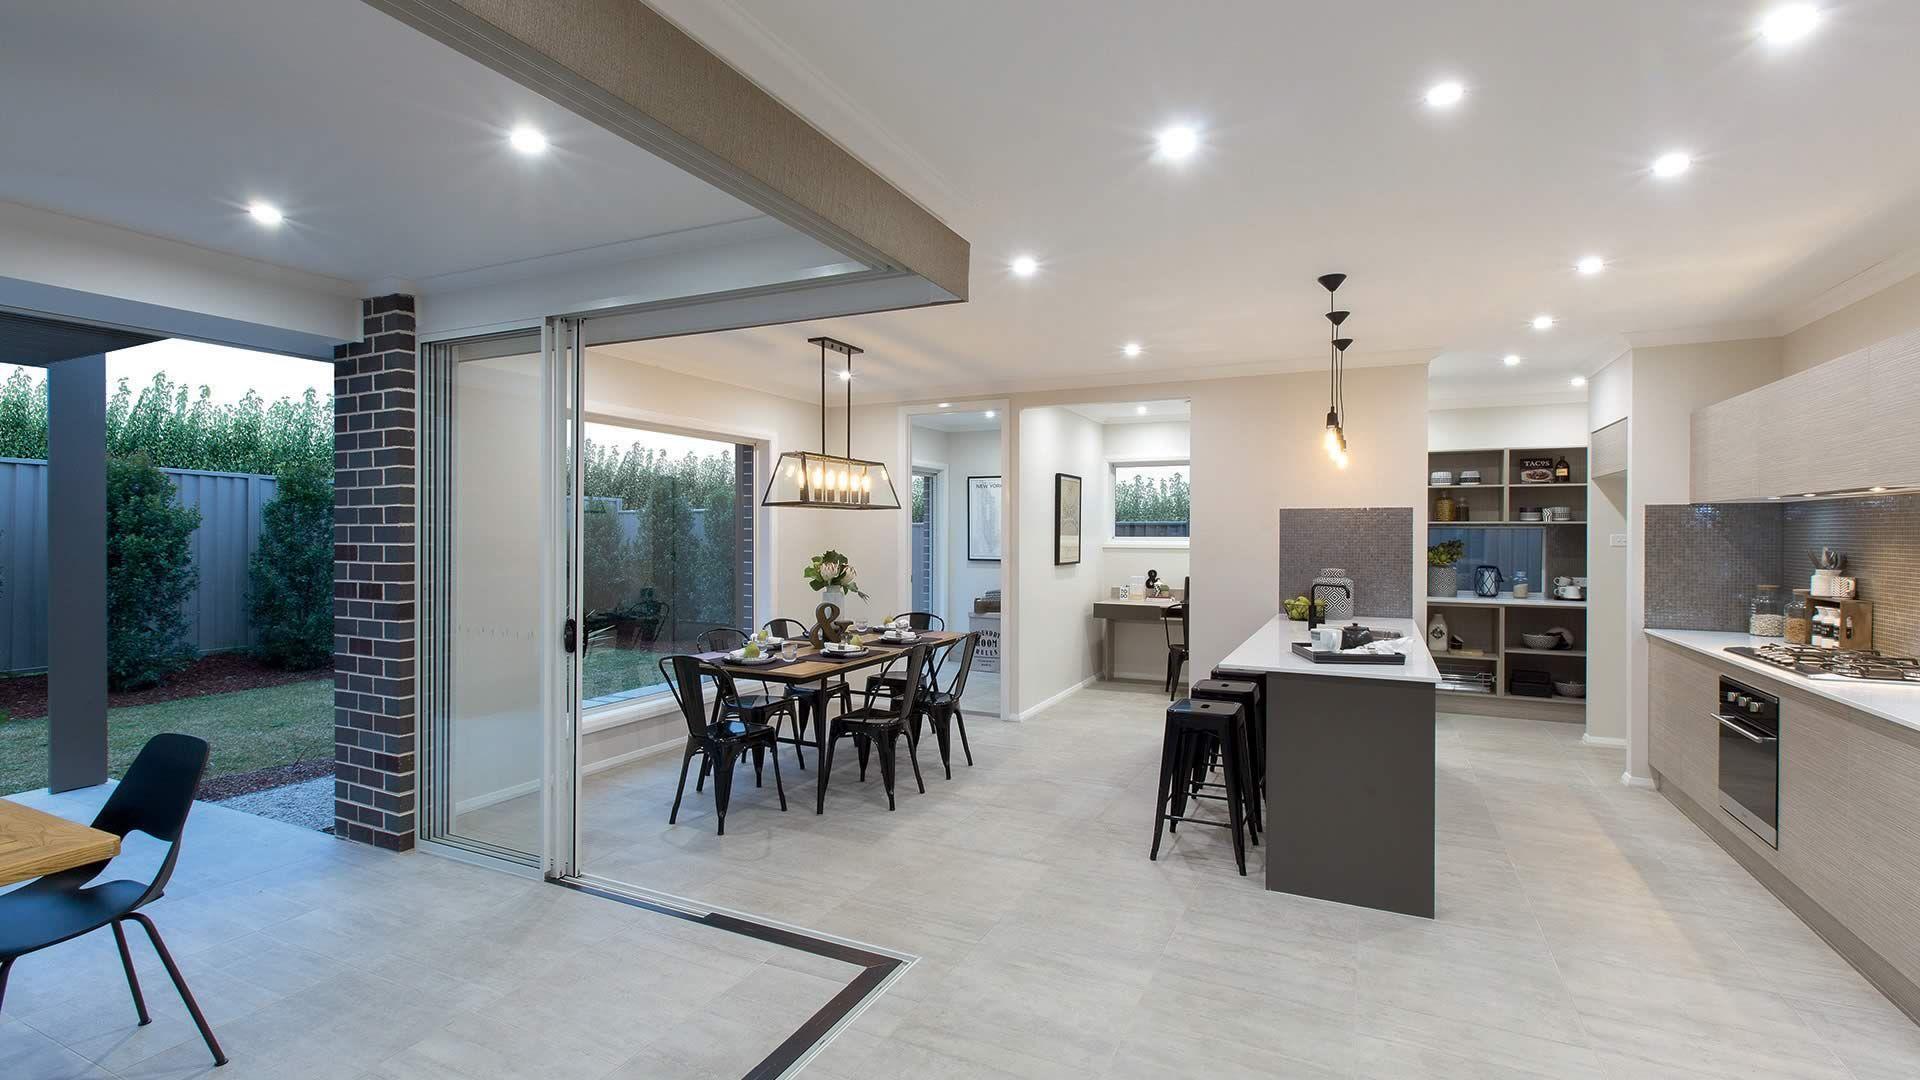 Livingstone - The Smart Living Series   Eden Brae Homes   Our ...